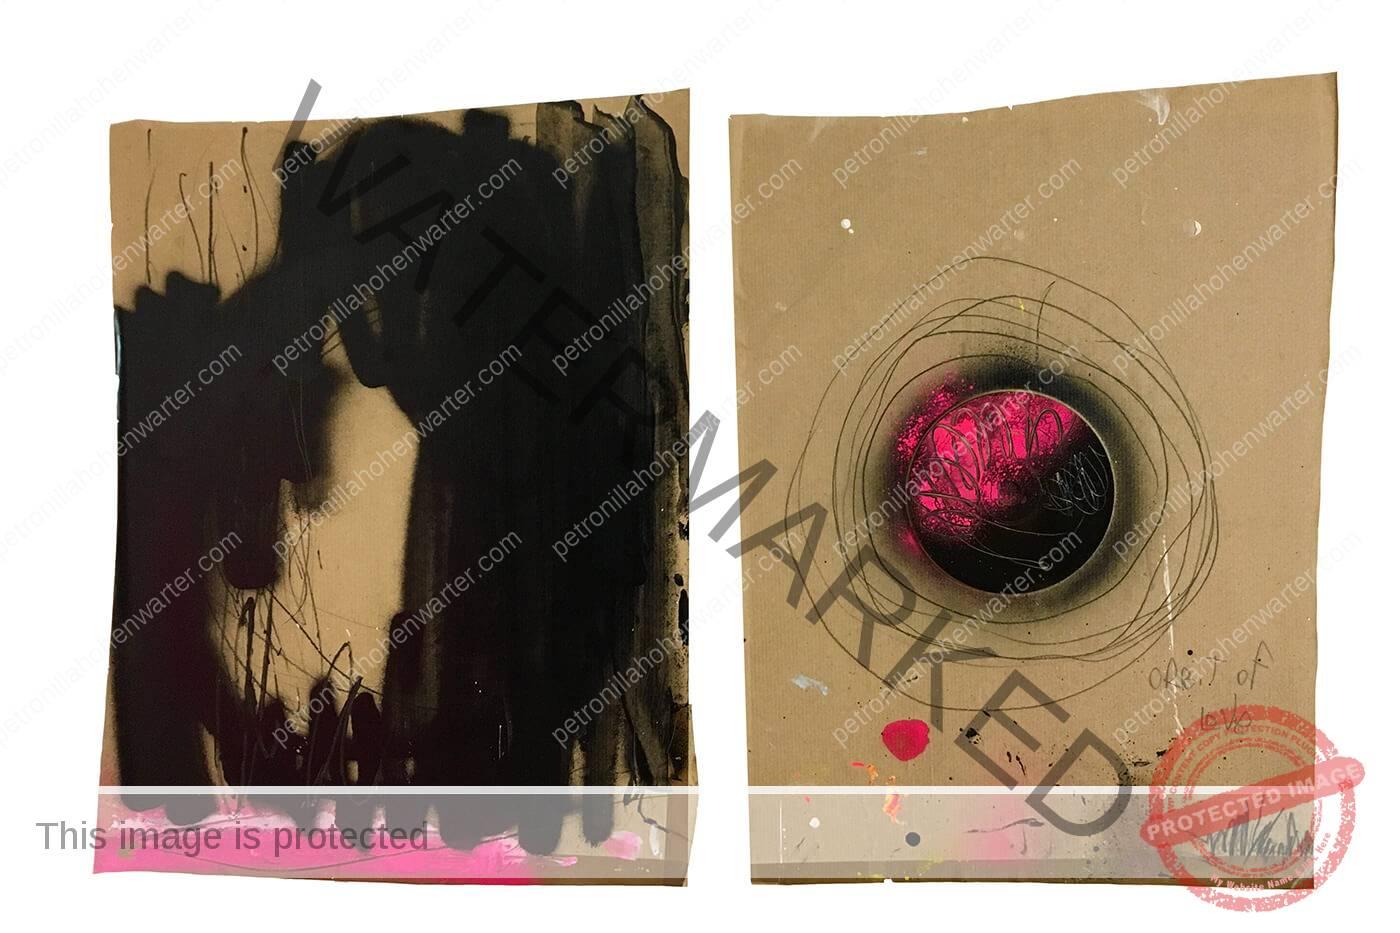 orbit of love Petronilla HohenwARTer abstract art black white painter